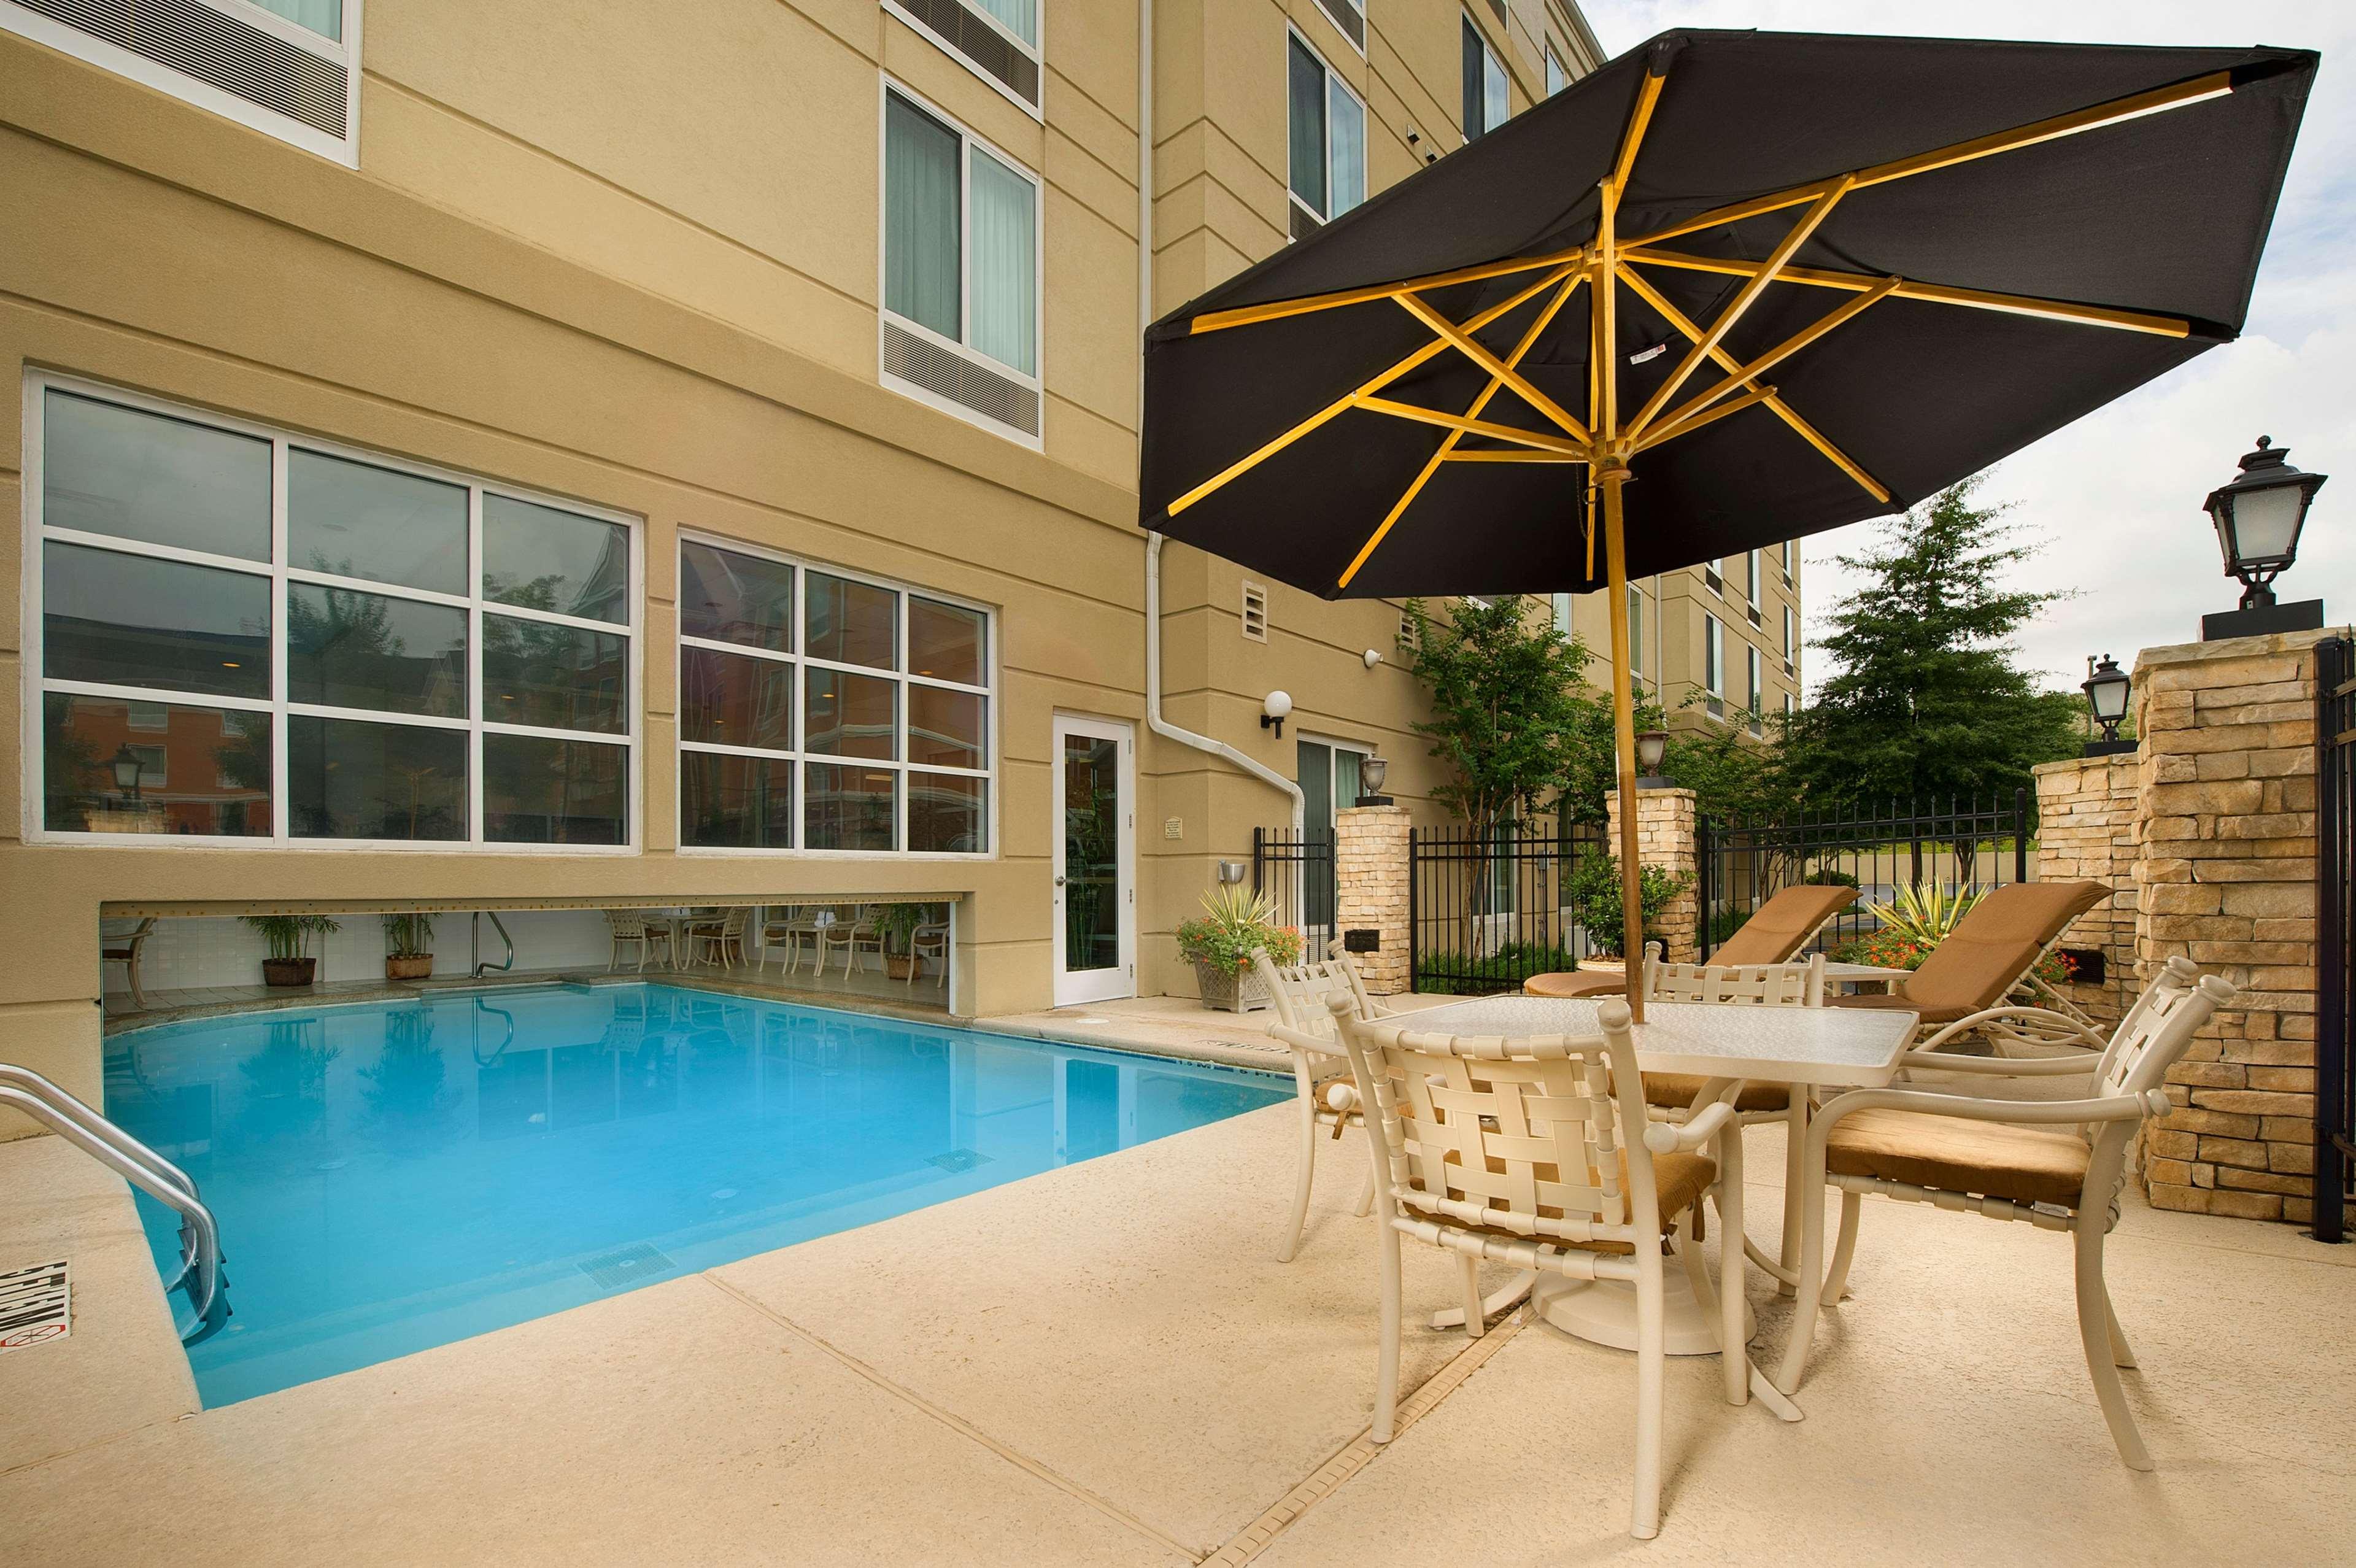 Hilton Garden Inn Atlanta NW/Kennesaw Town Center image 6